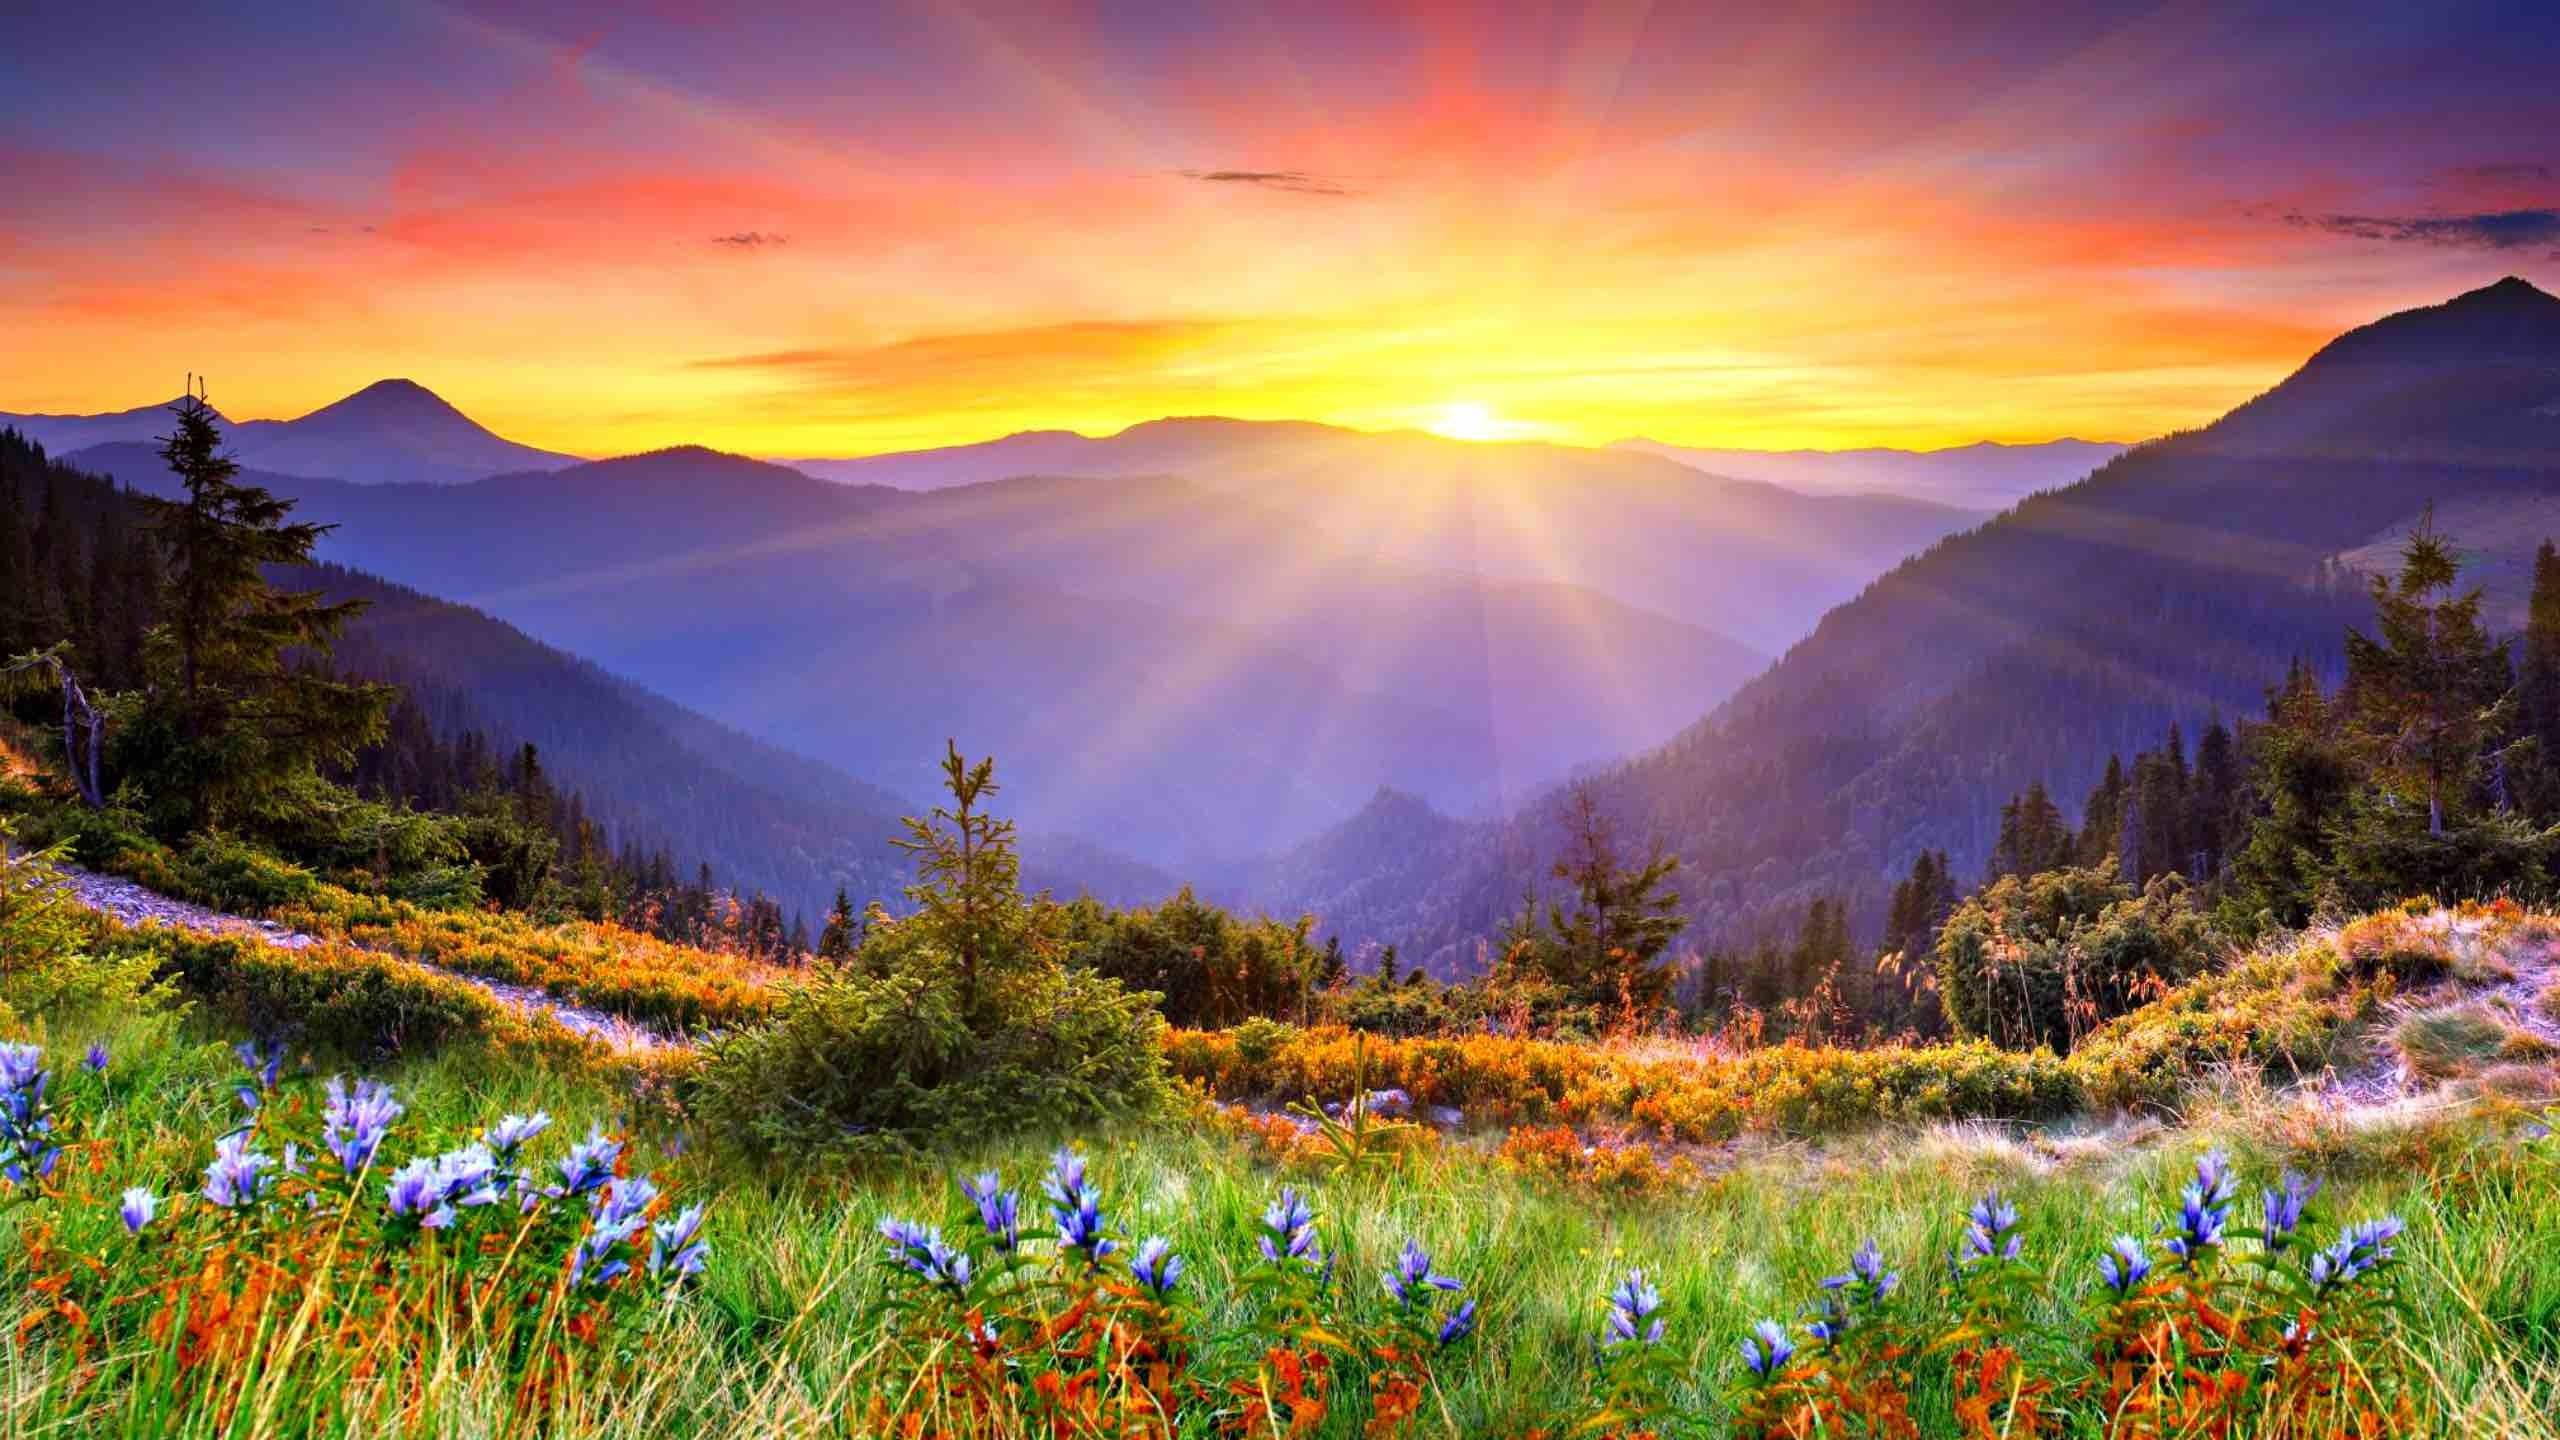 beautiful-sunrise-wallpaper-34171-34940-hd-wallpapers